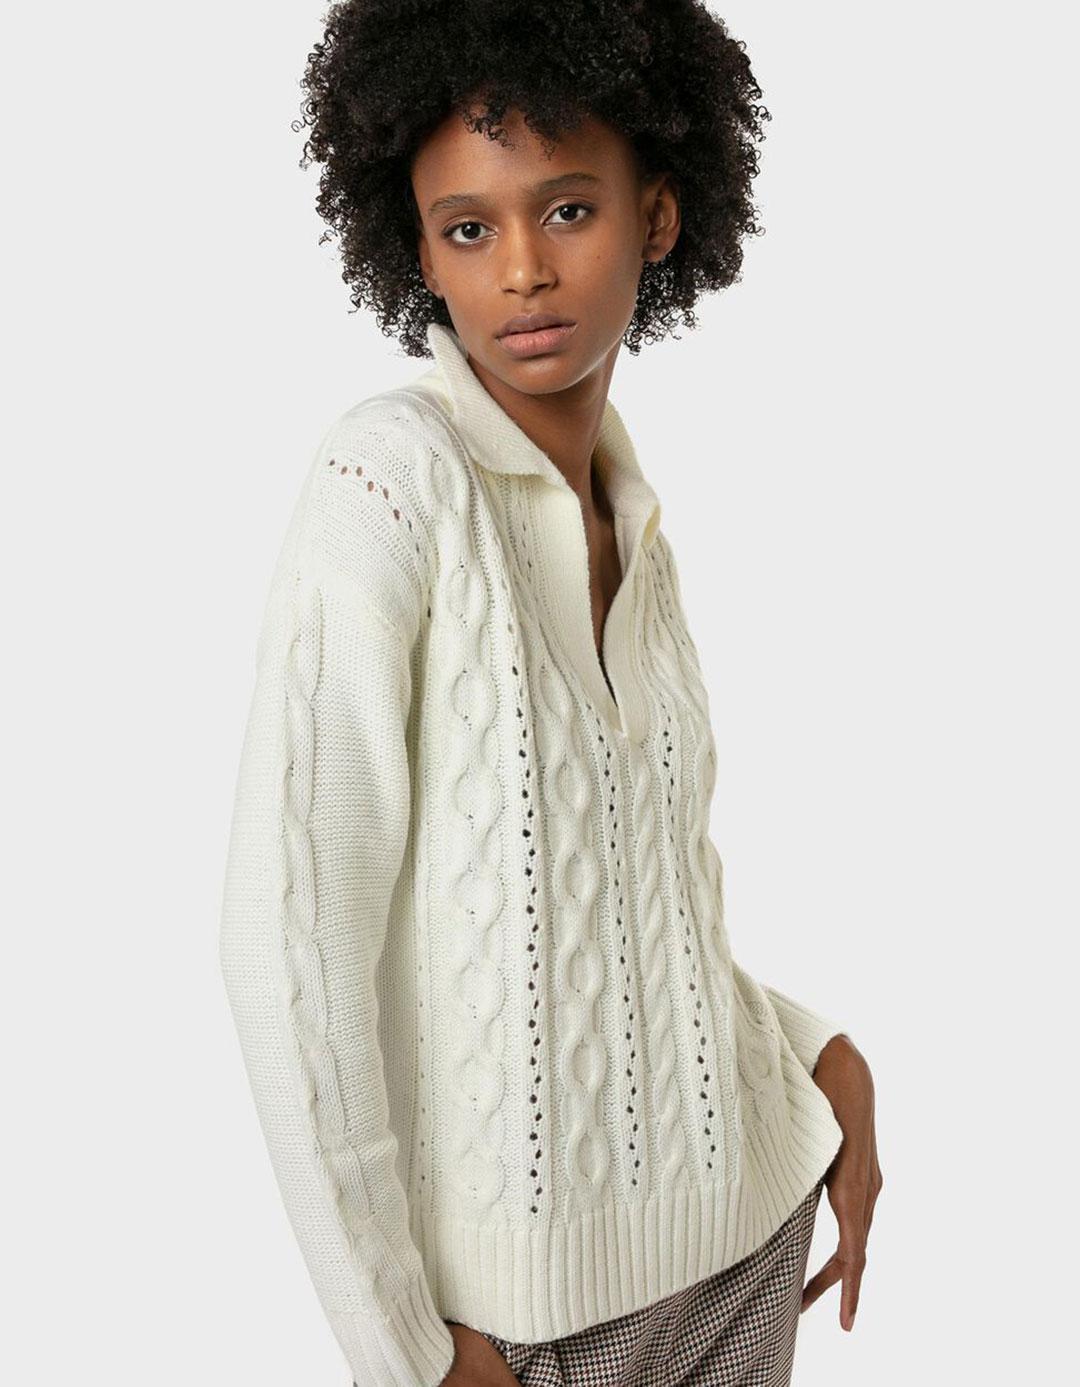 AILINY for MO fashion store